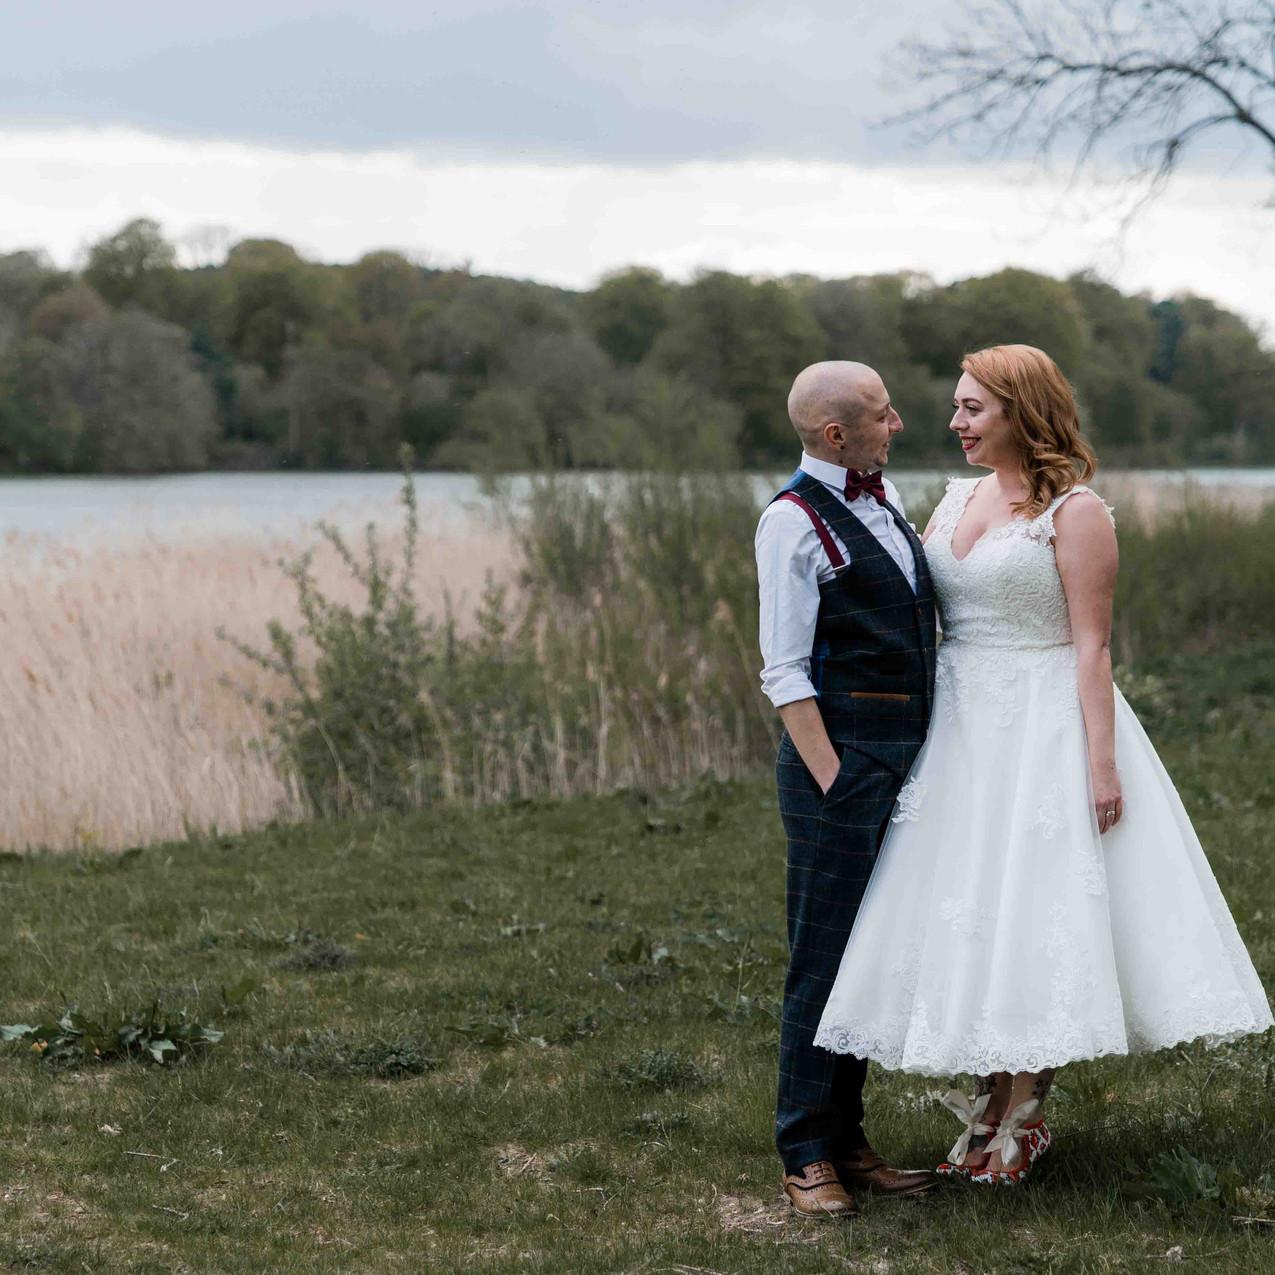 YSP wedding photographer